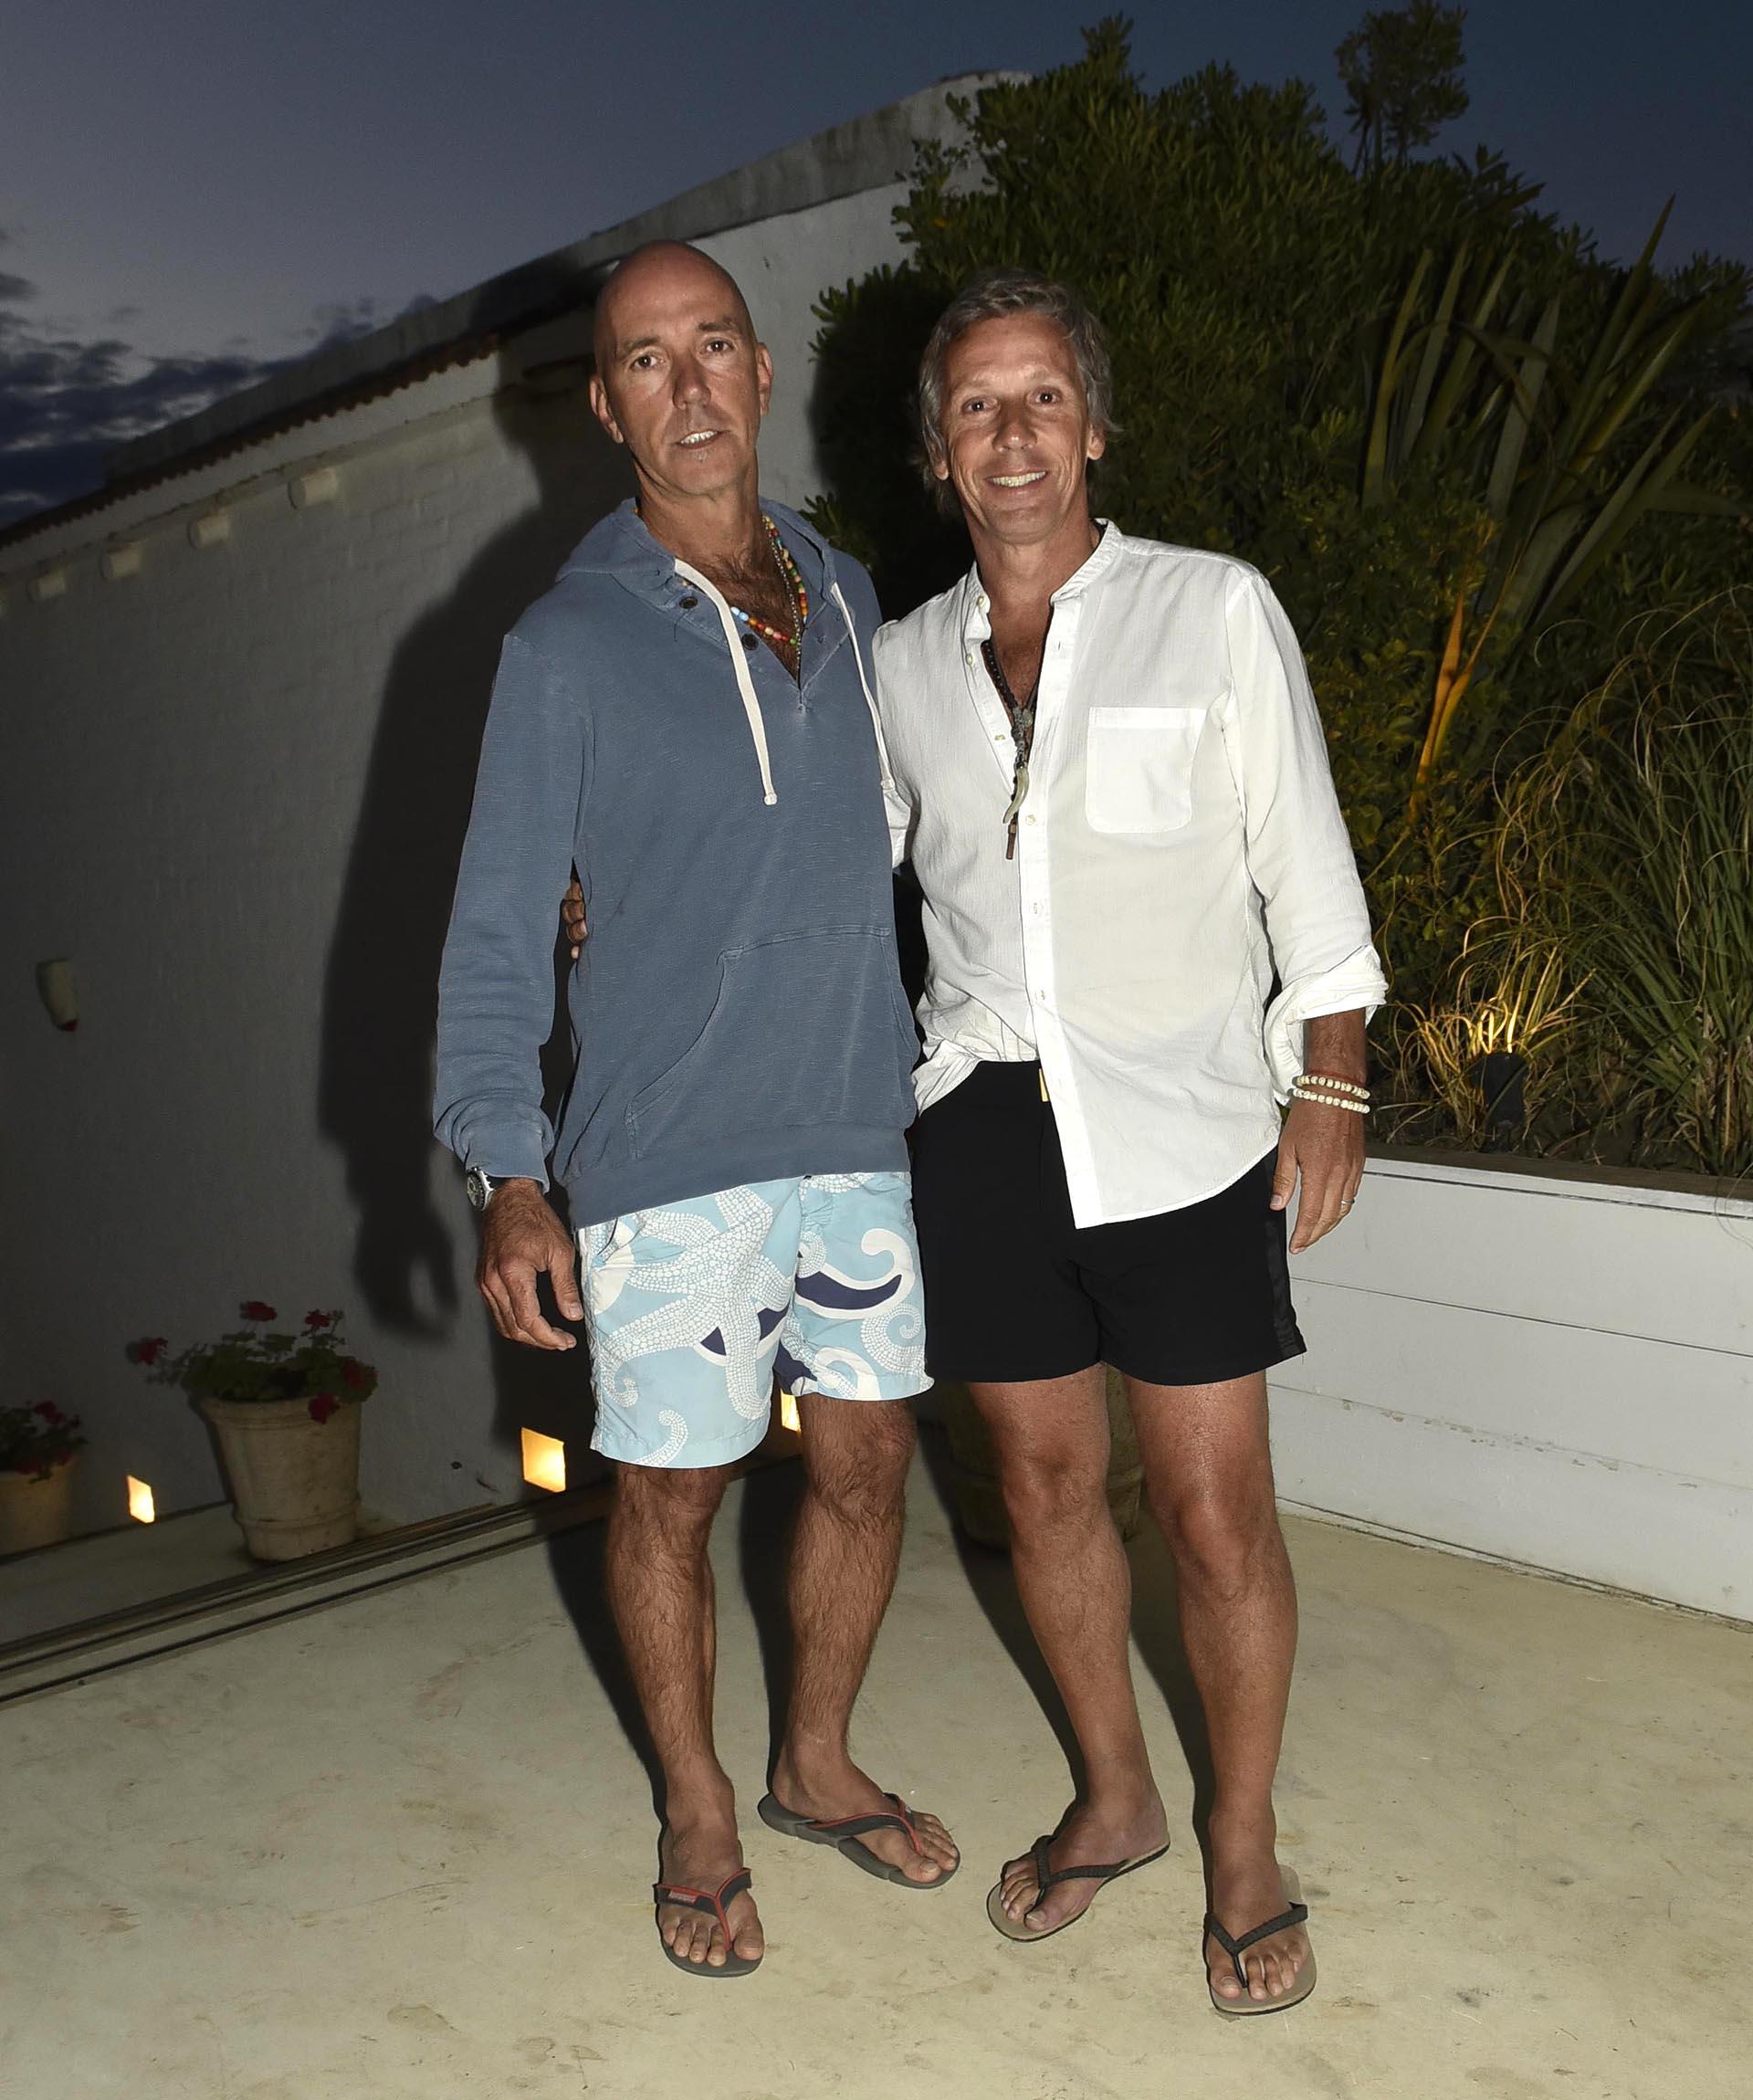 Ignacio Azumendi y Alejandro Gravier